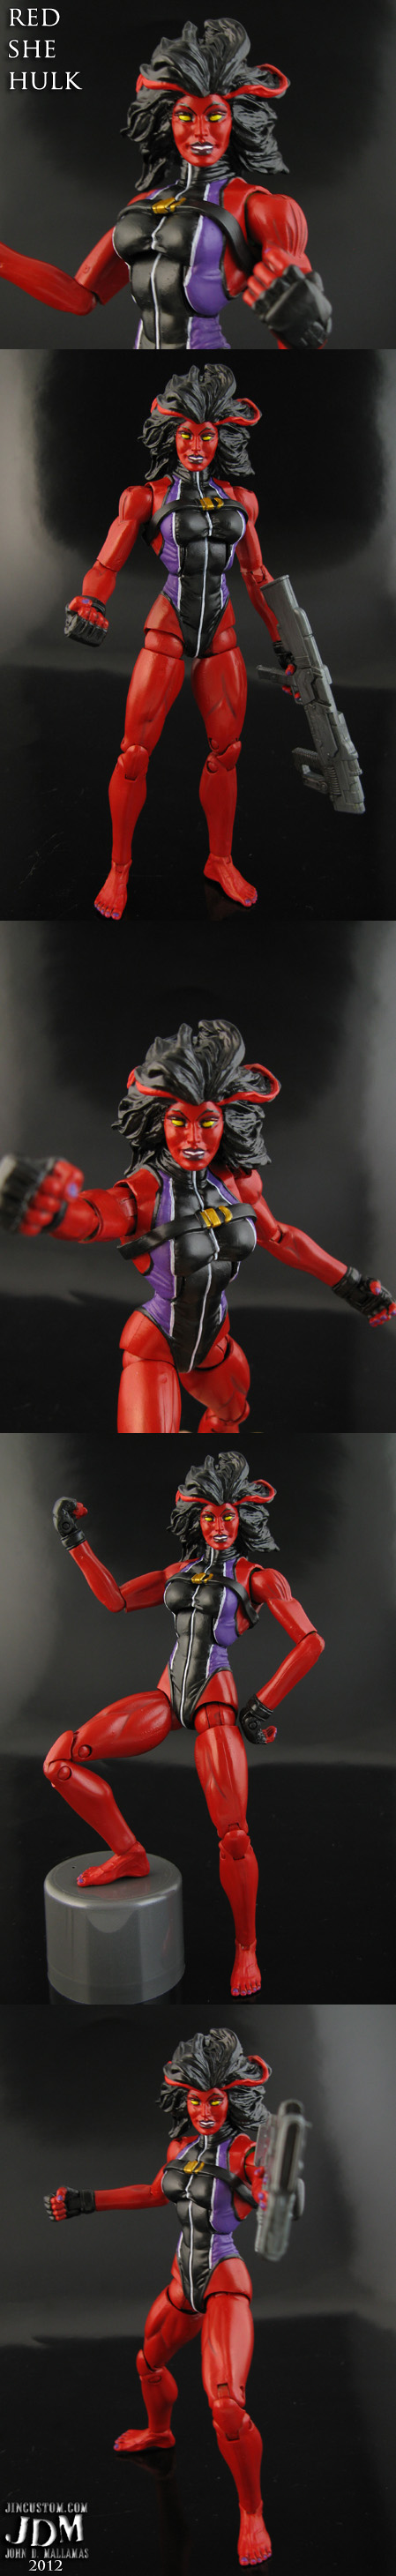 Red She Hulk Marvel Legends